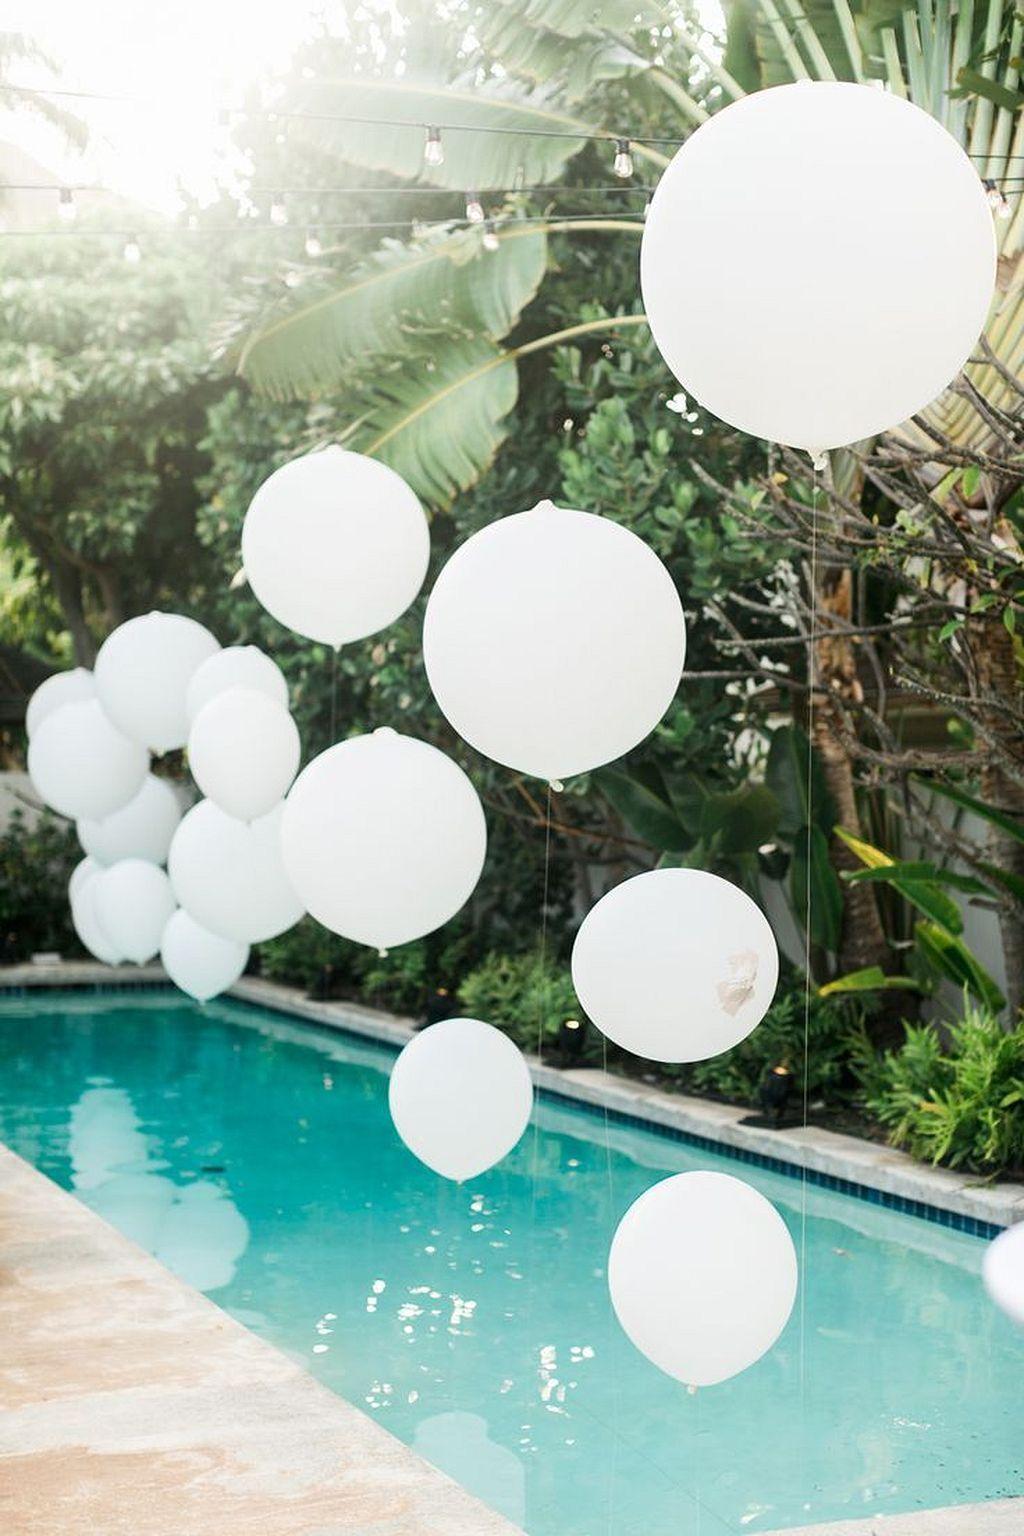 40+ Summer Engagement Party at Backyard | Engagements